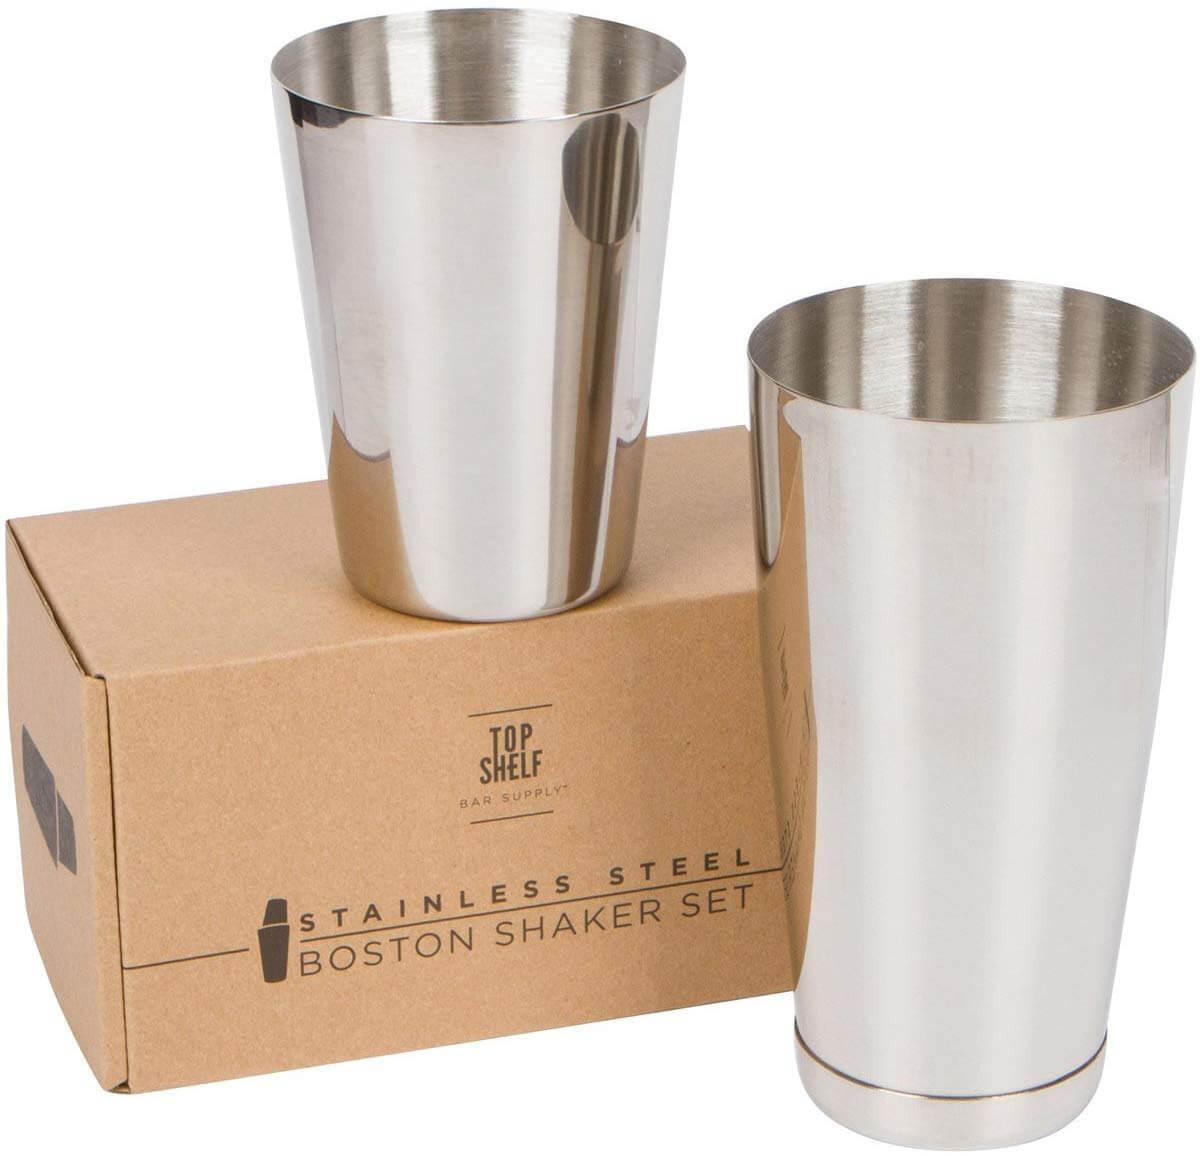 TOP SHELF BAR SUPPLY Premium Cocktail Shaker Set